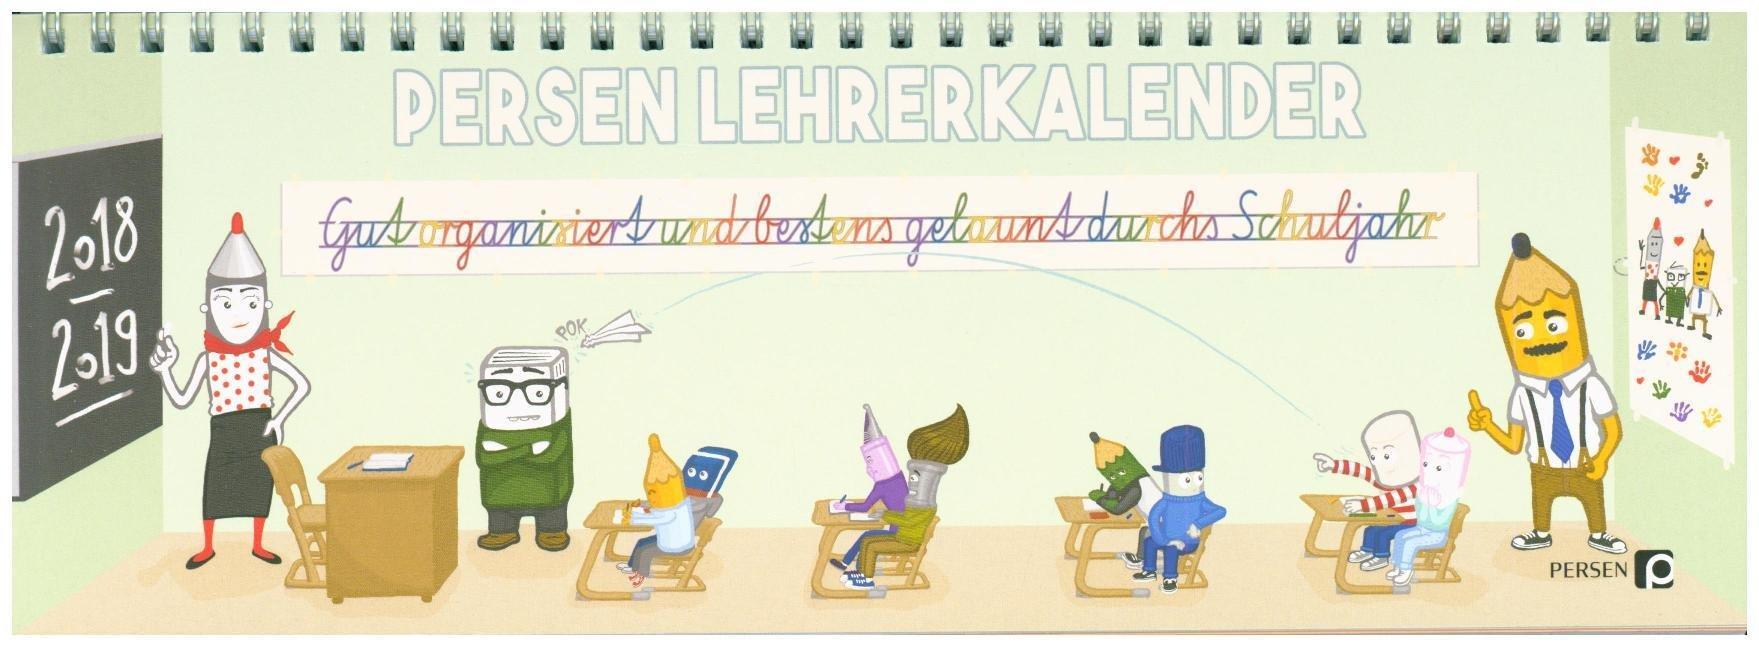 PERSEN Lehrerkalender 2018/19: Lehrerplaner, Schuljahresplaner, Schuljahreskalender, Lehrer-Tischkalender, Lehrer-Wochenkalender (Alle Klassenstufen)